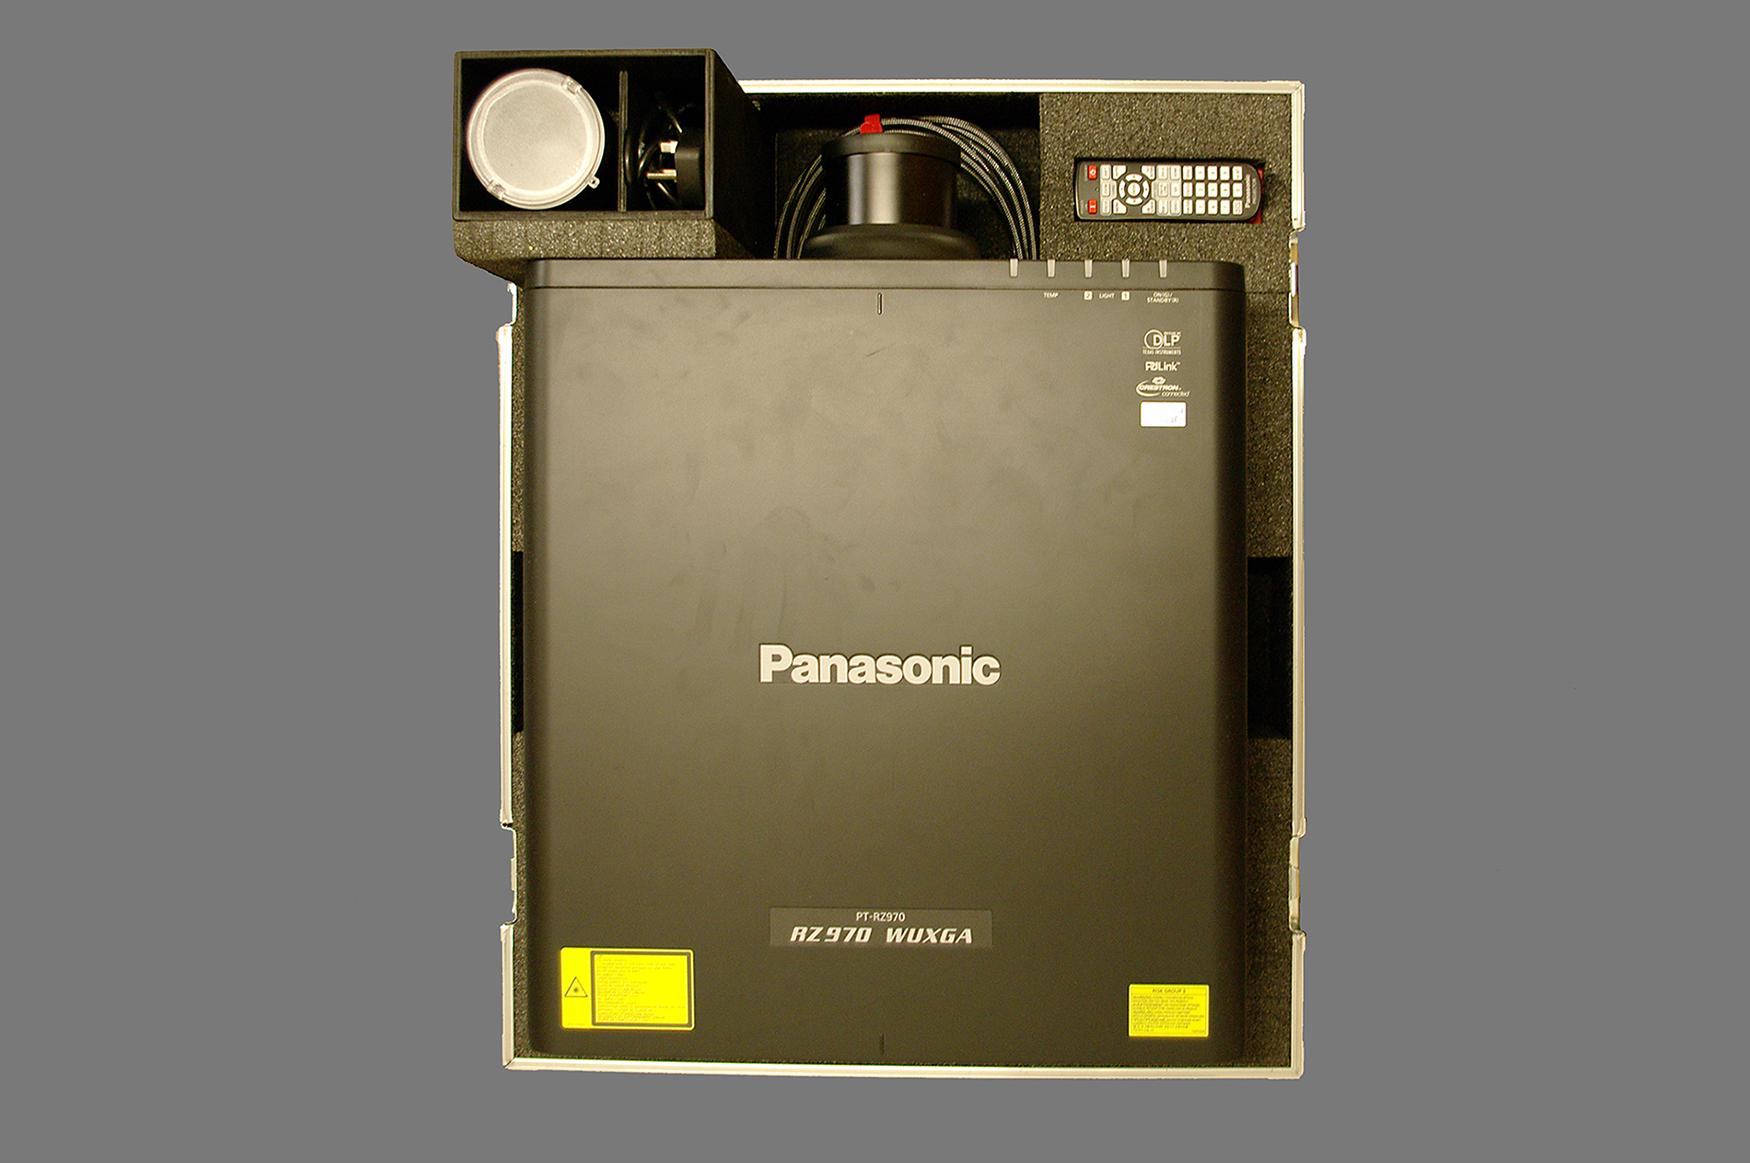 Panasonic projector case_04